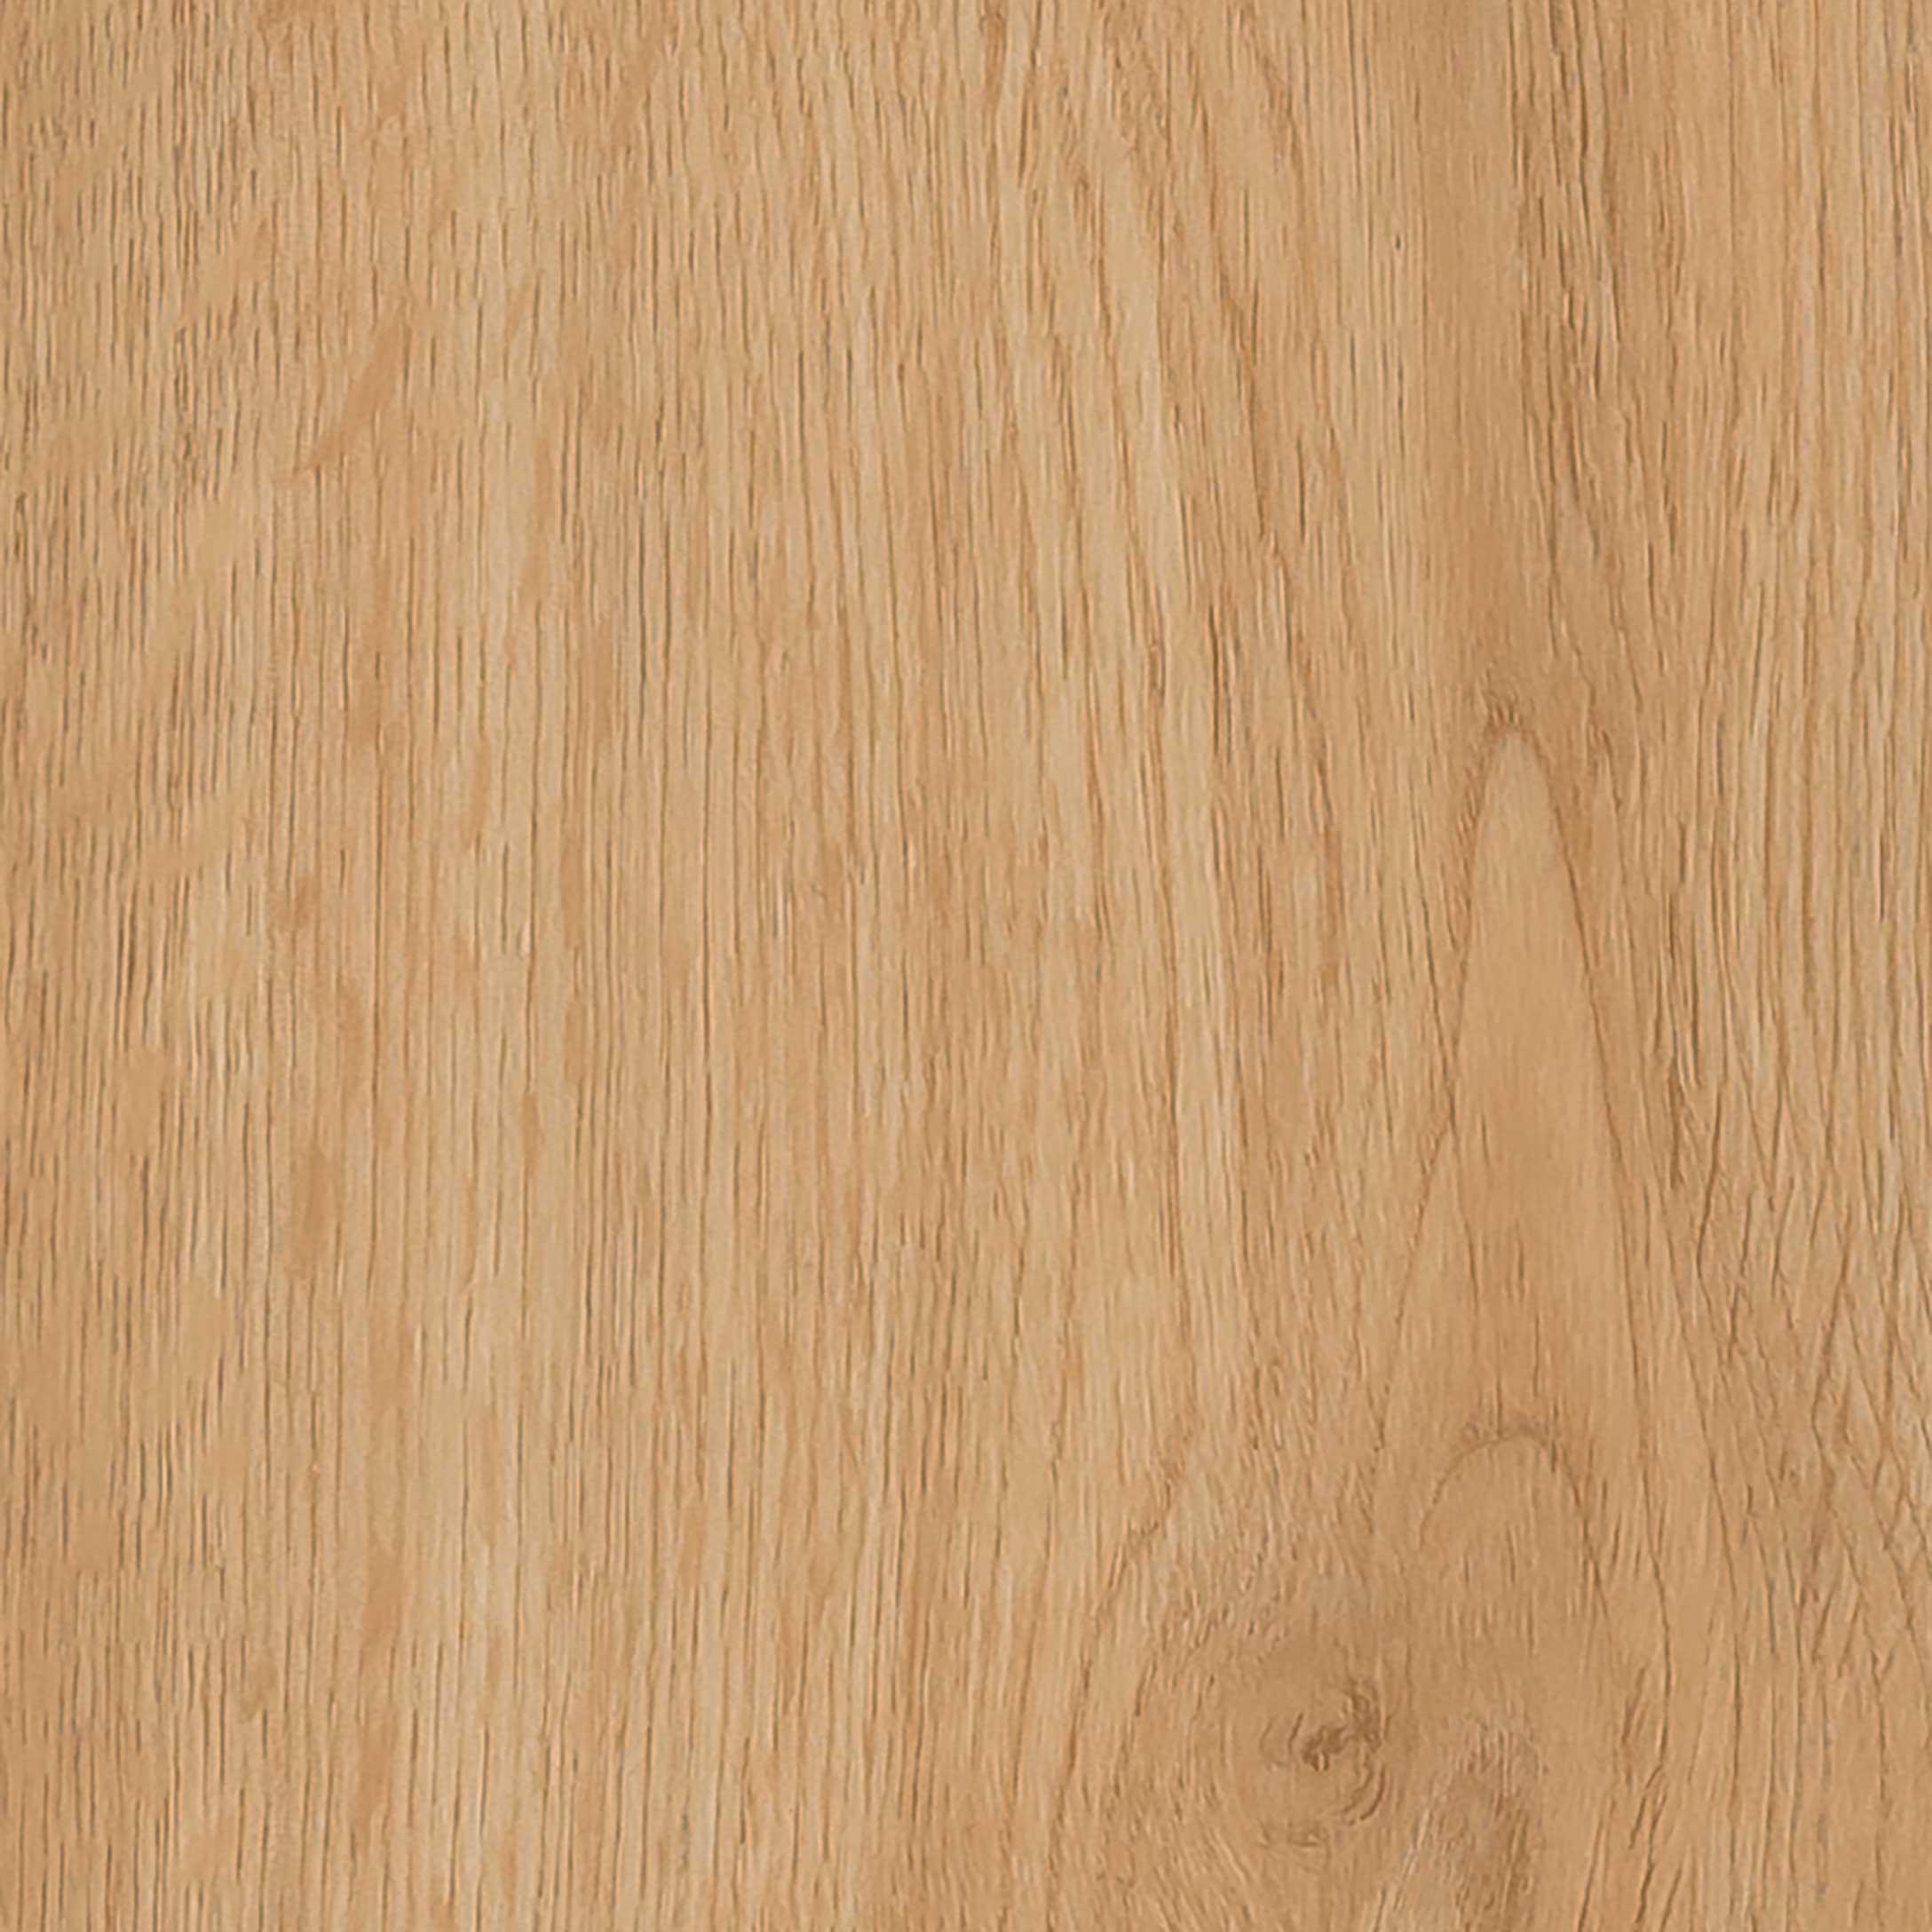 French Oak, blond 2869